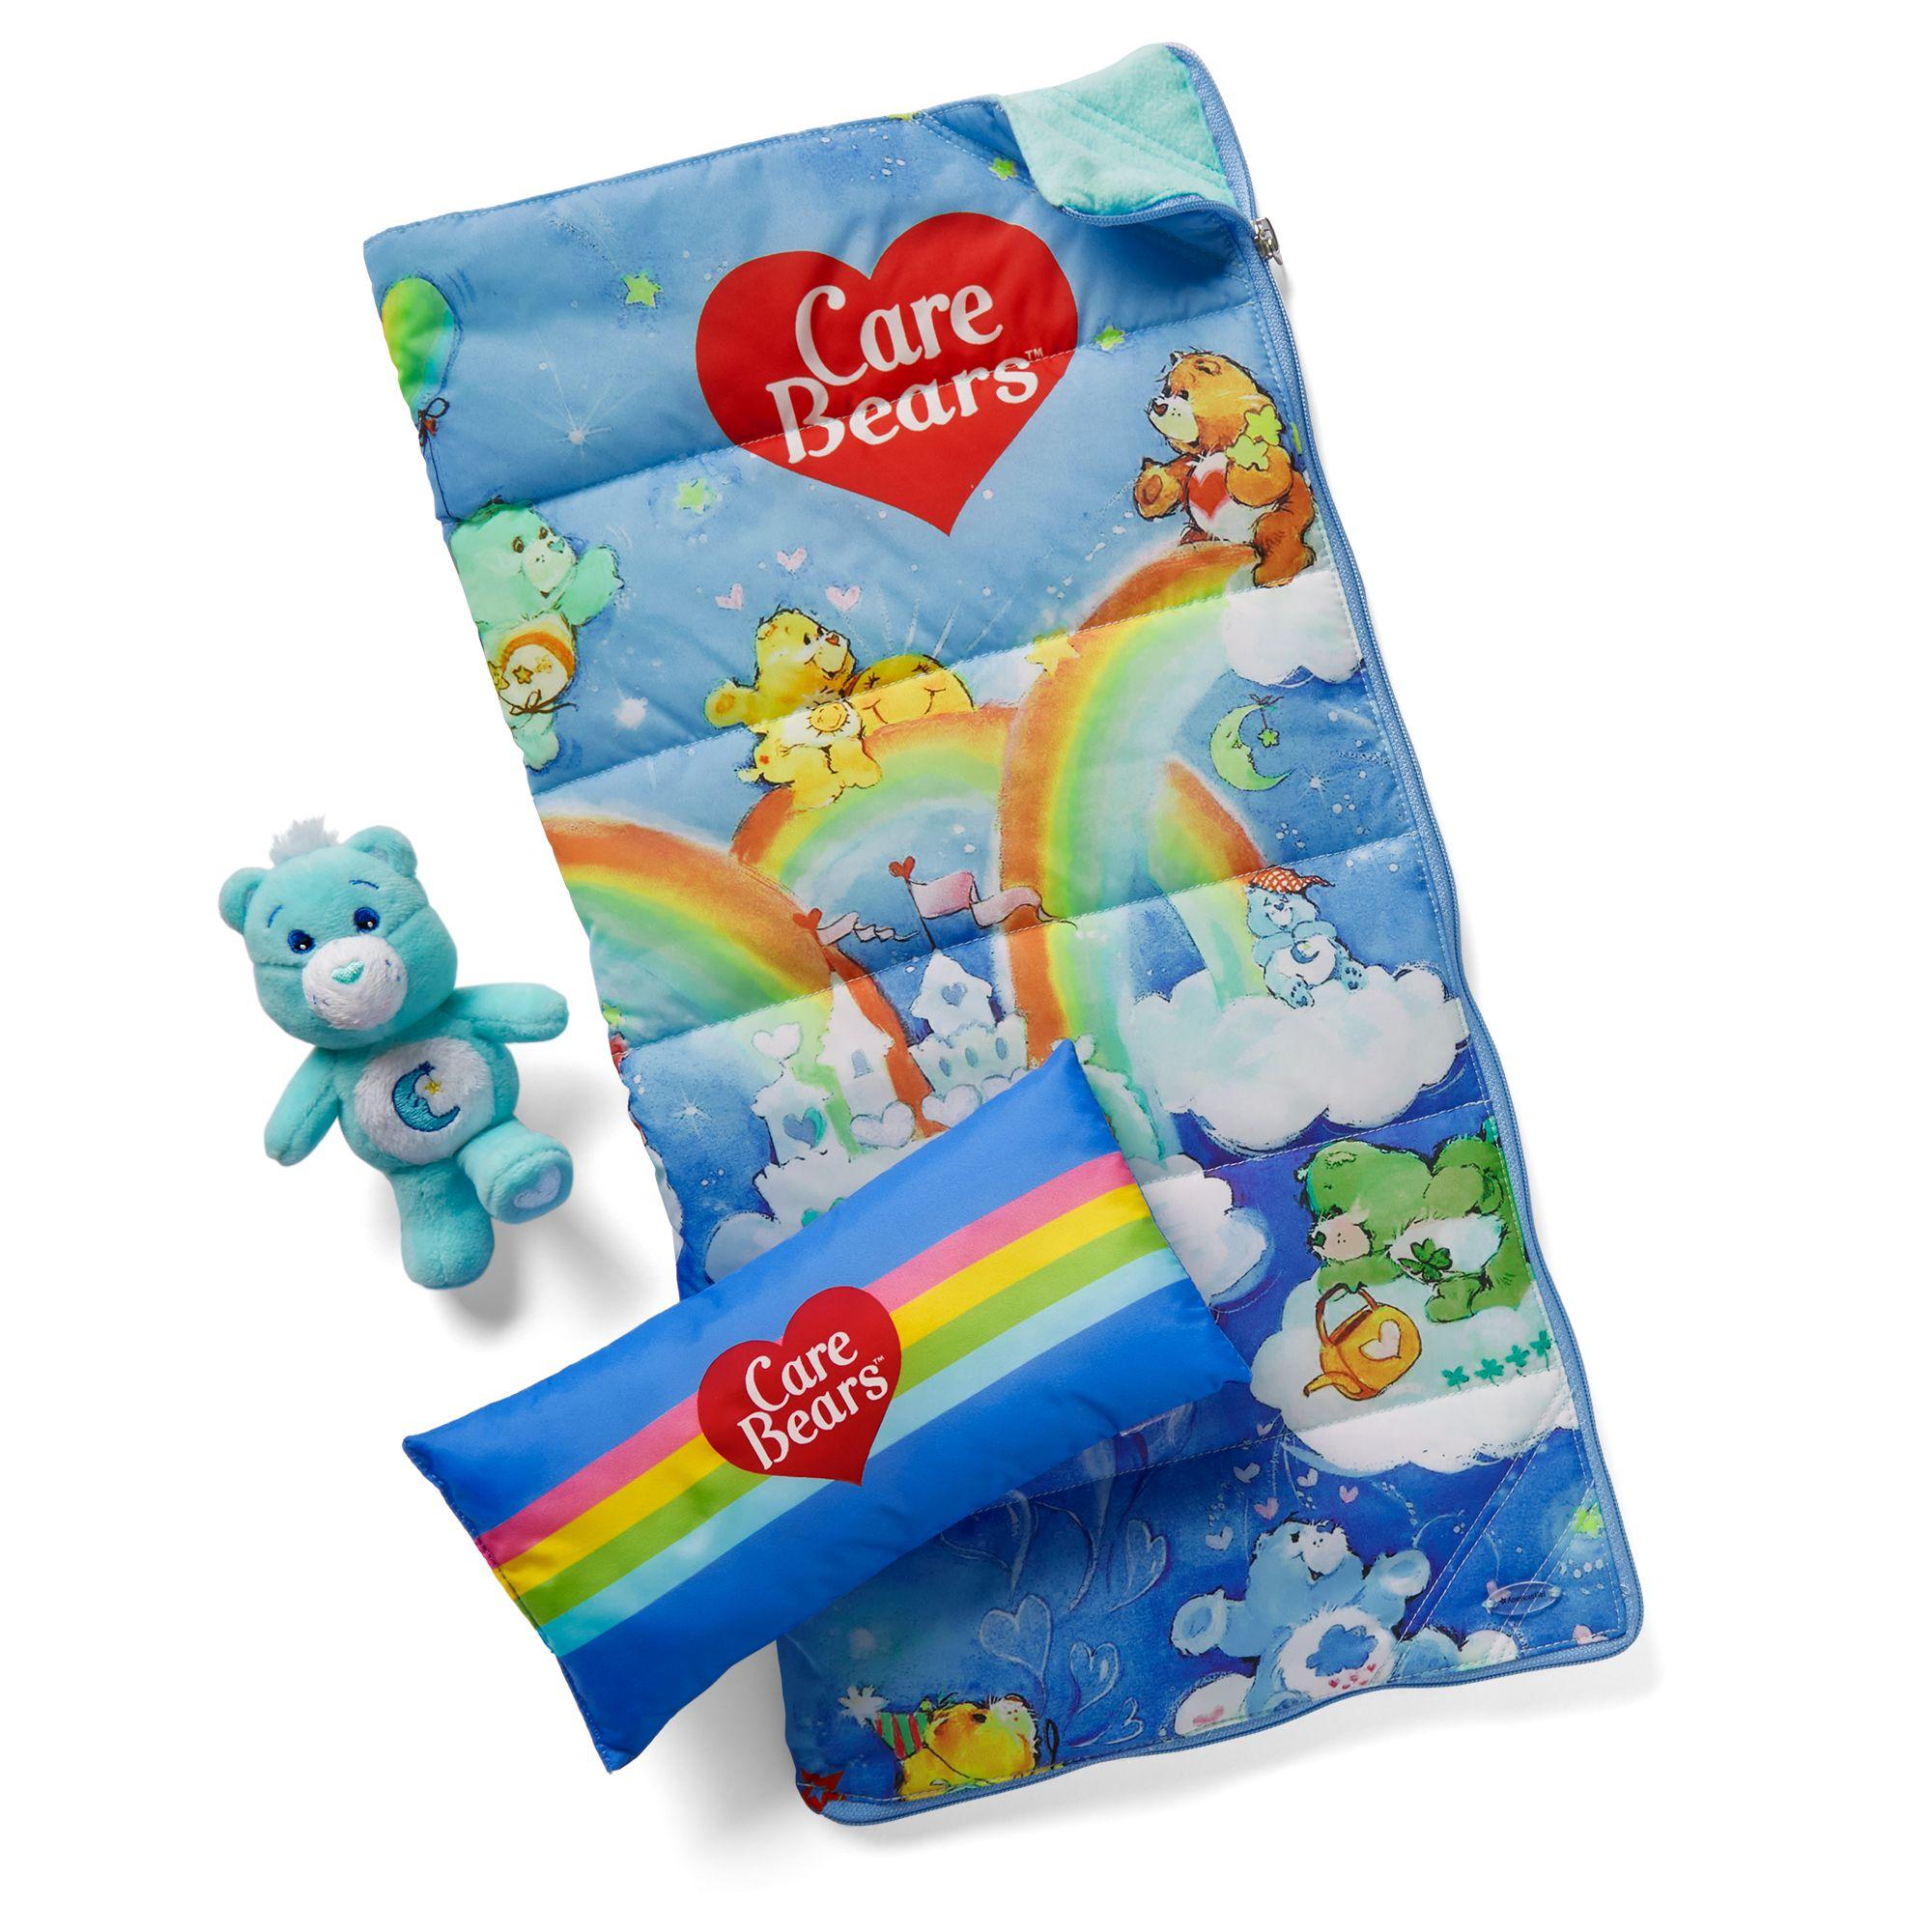 Courtney's Care Bears Sleeping Bag Set